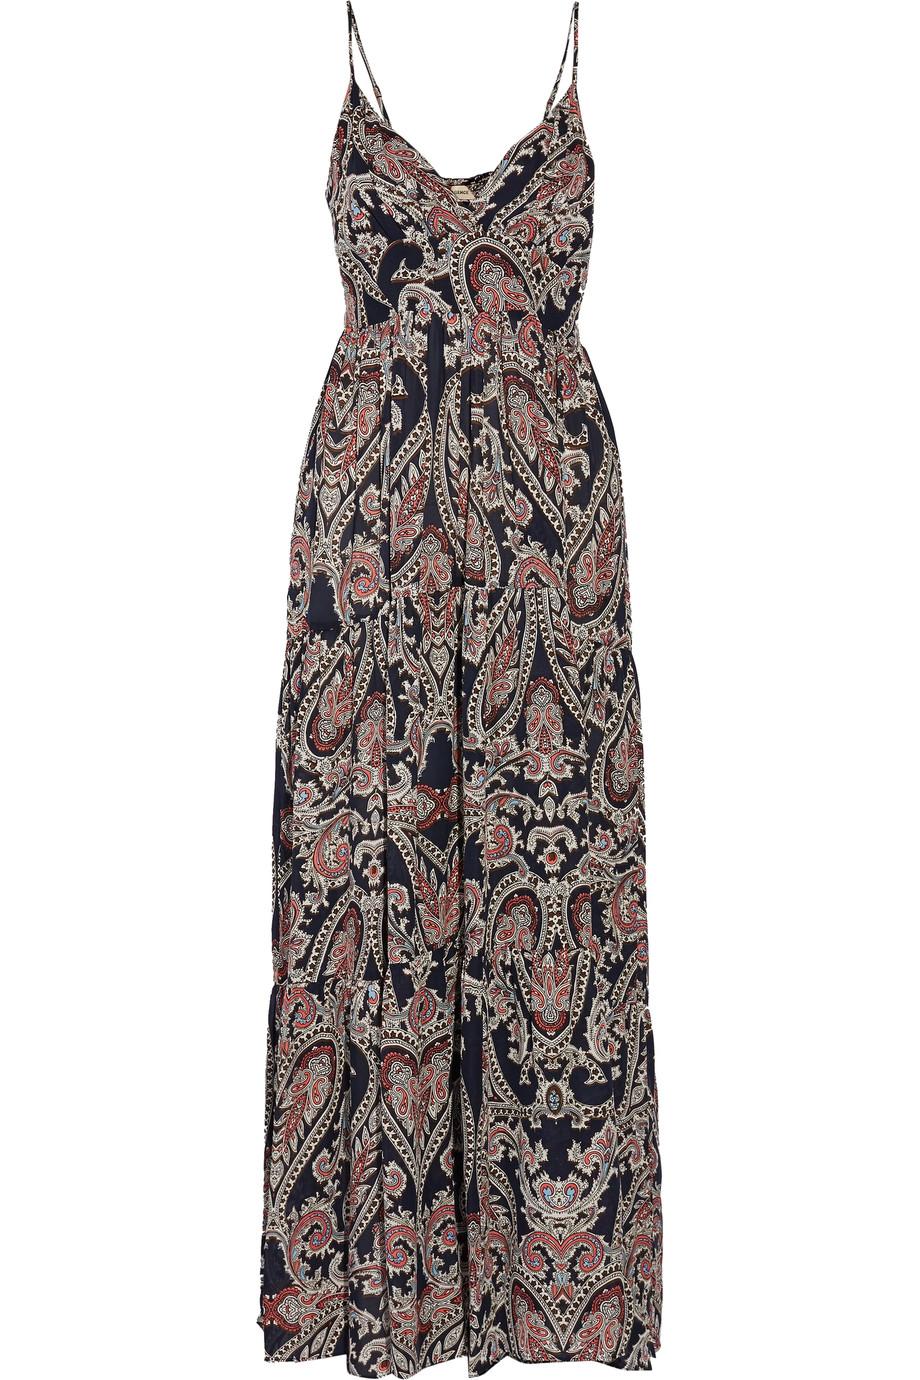 L Agence Silks HONORE SMOCKED PRINTED SILK MAXI DRESS